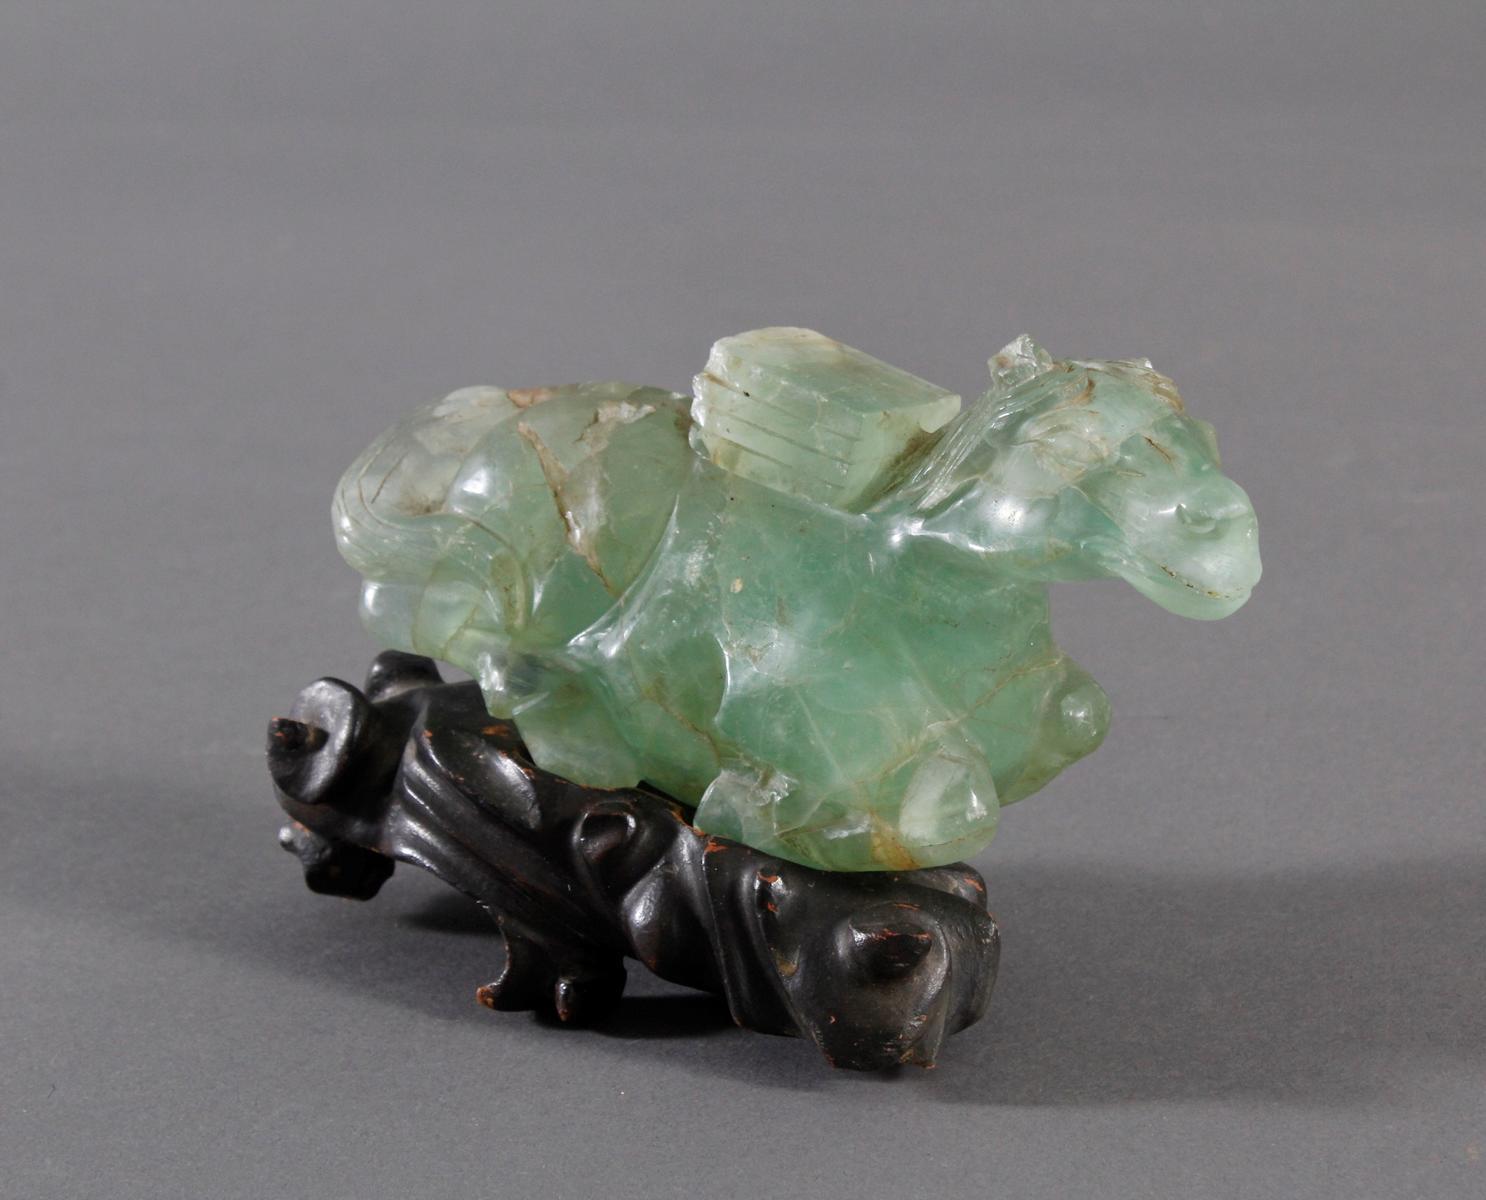 Tierplastik aus Beryll, China 19. Jahrhundert-2